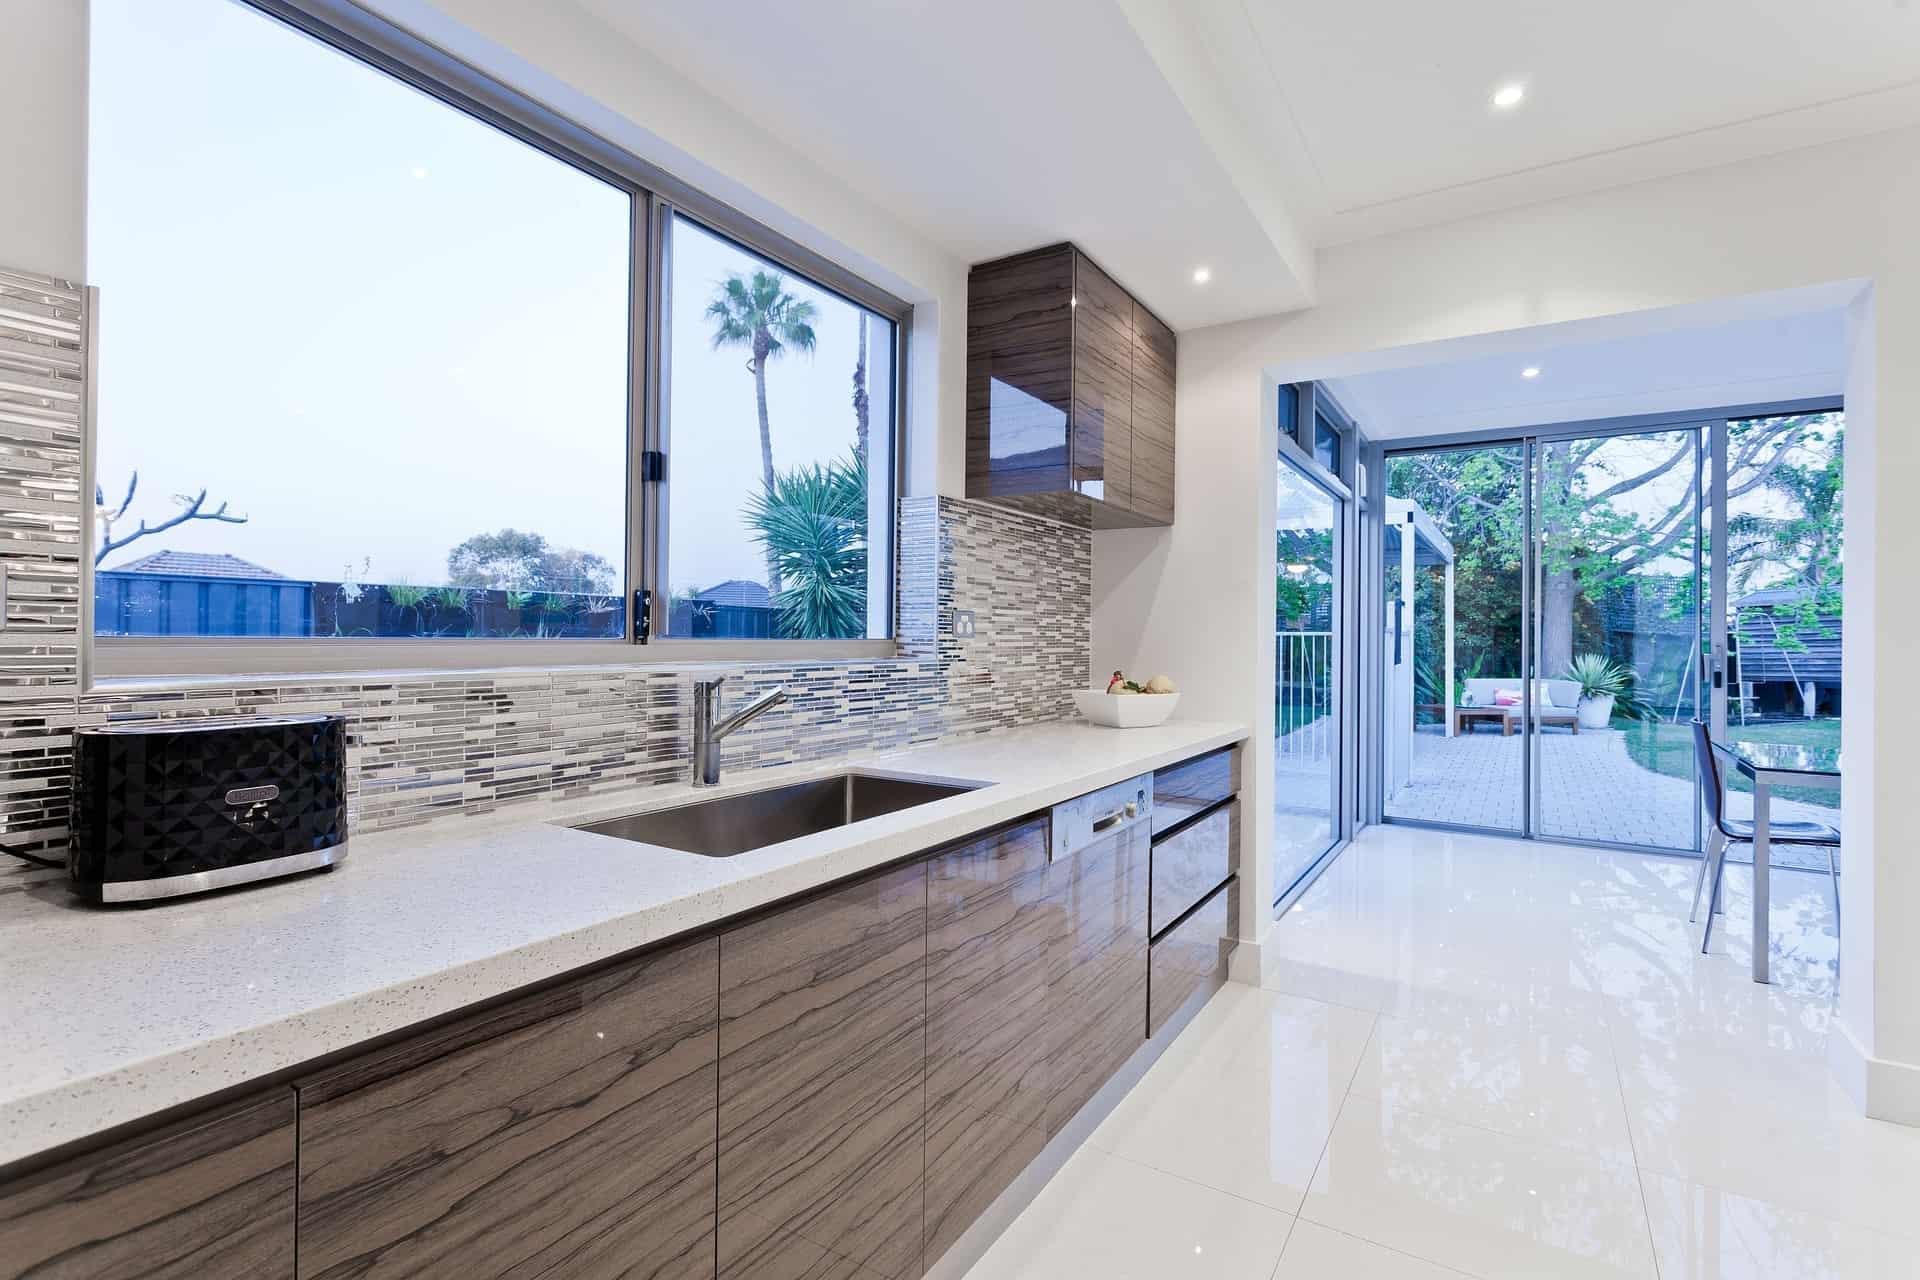 Kitchen Remodeling Palm Desert California. Indian Wells Custom Kitchens.  Designer Kitchens Indian Wells